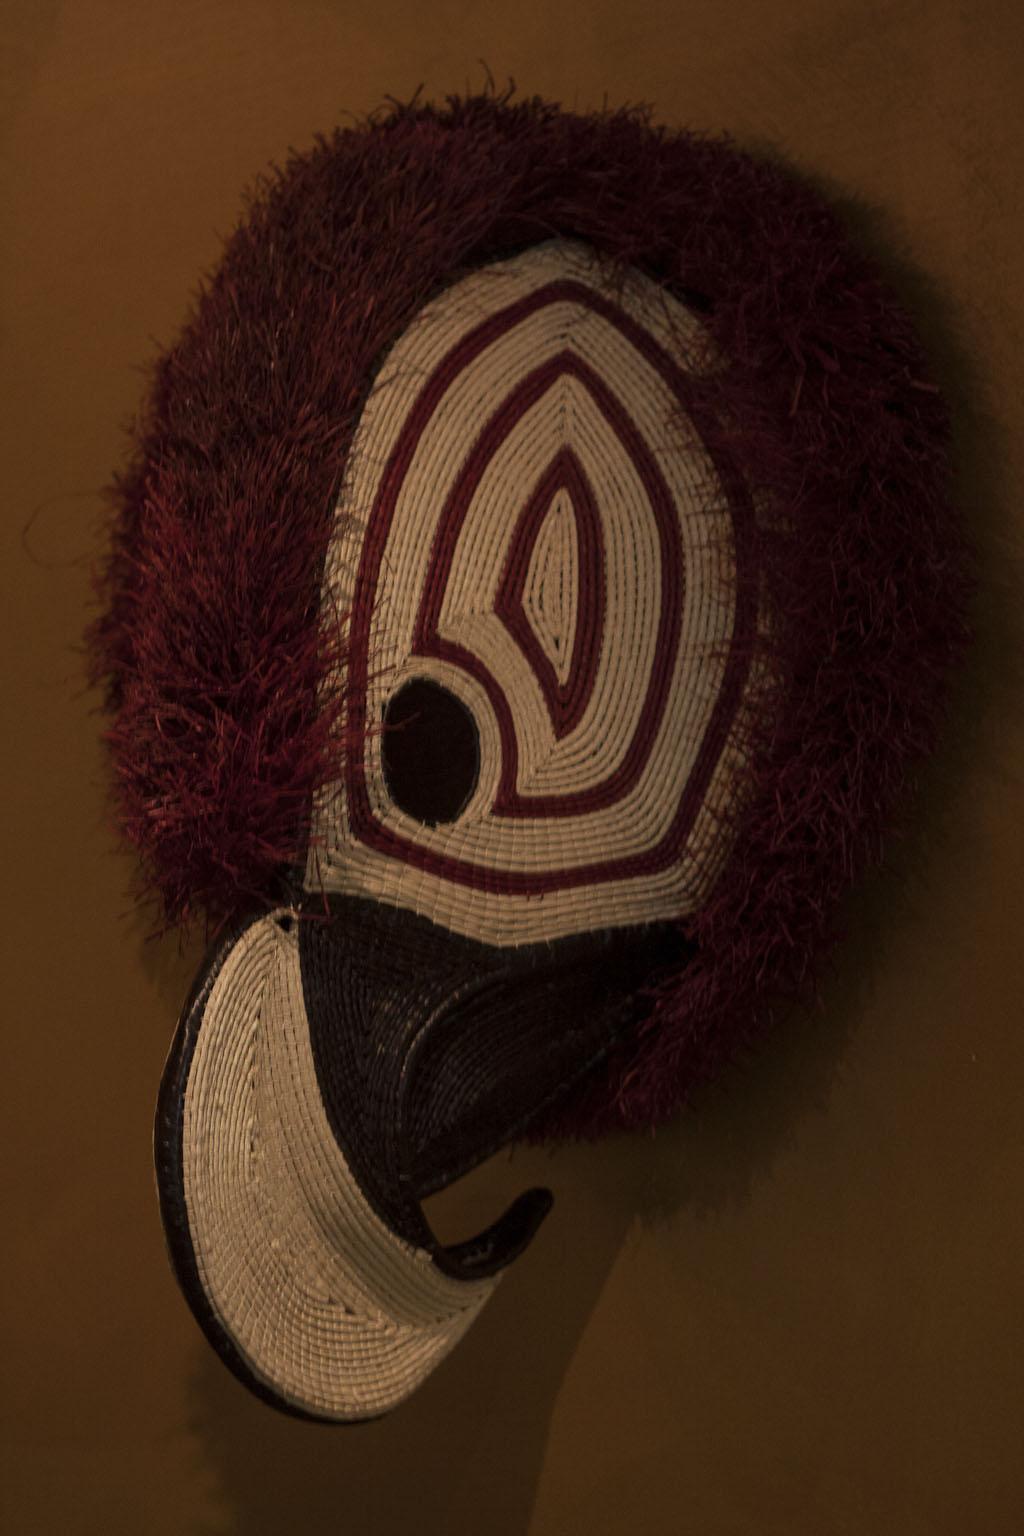 Corinne Bally - société Ethic et Tropic - Masques Chunga, Panama